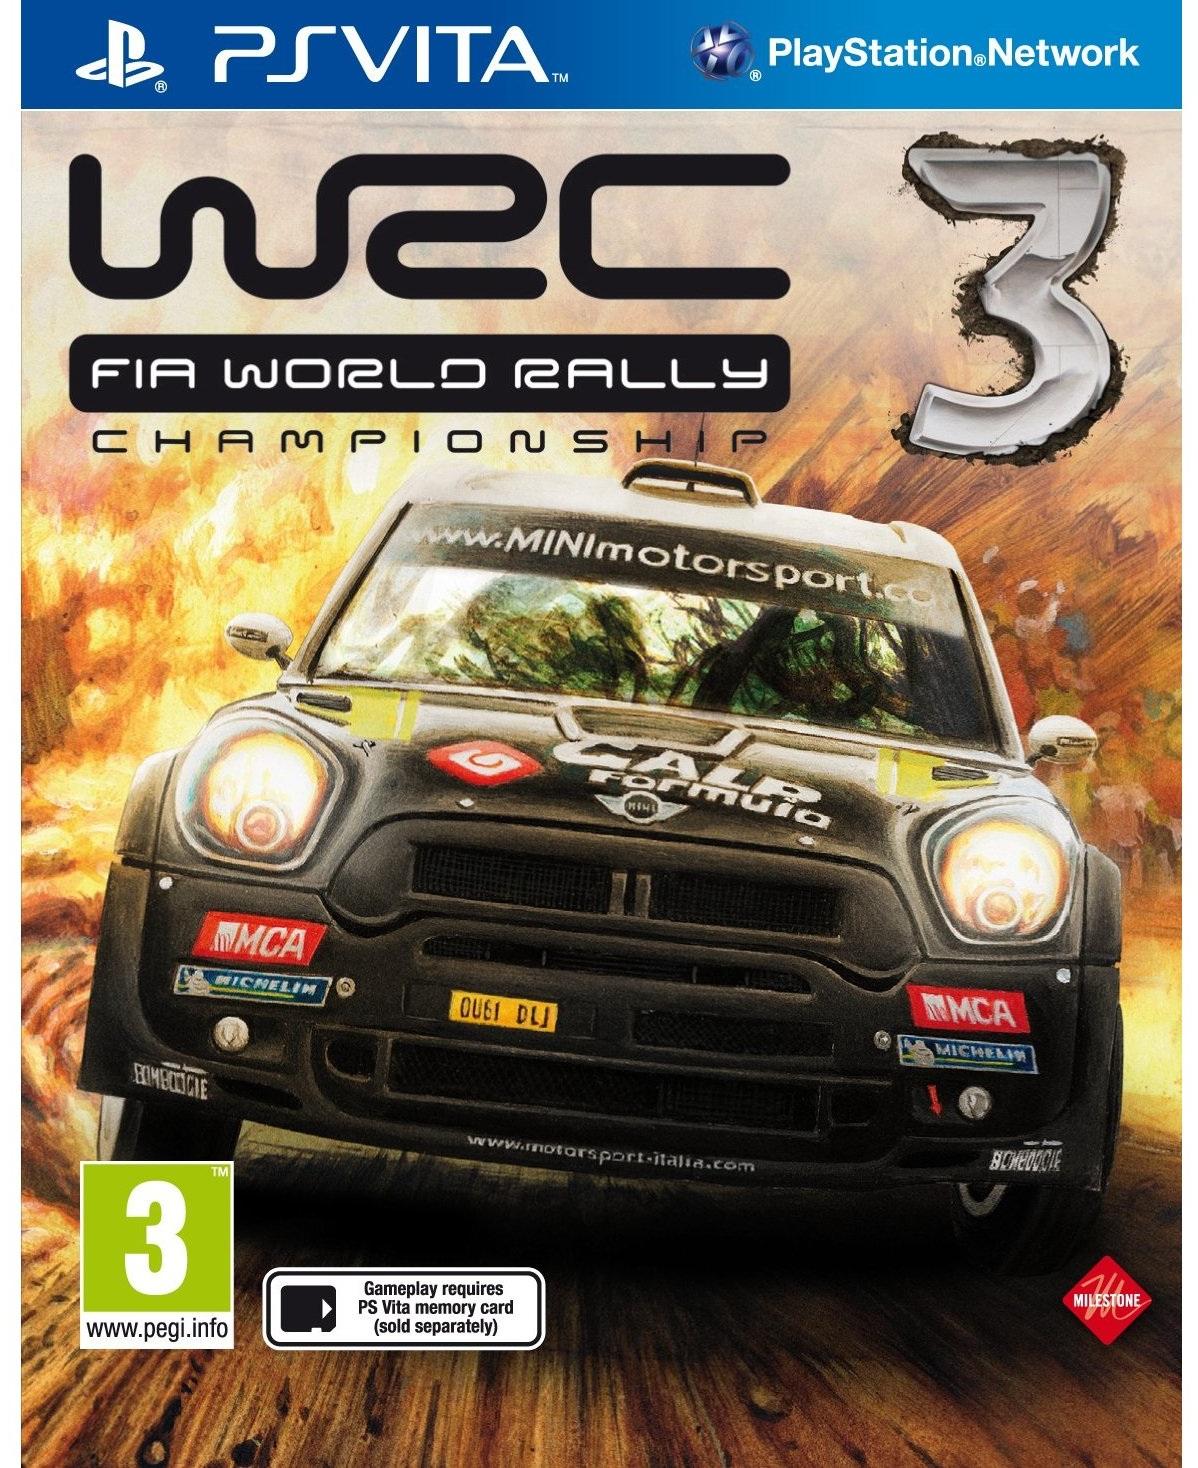 WRC3: World Rally Championship (PS Vita) – Review • GadgetyNews